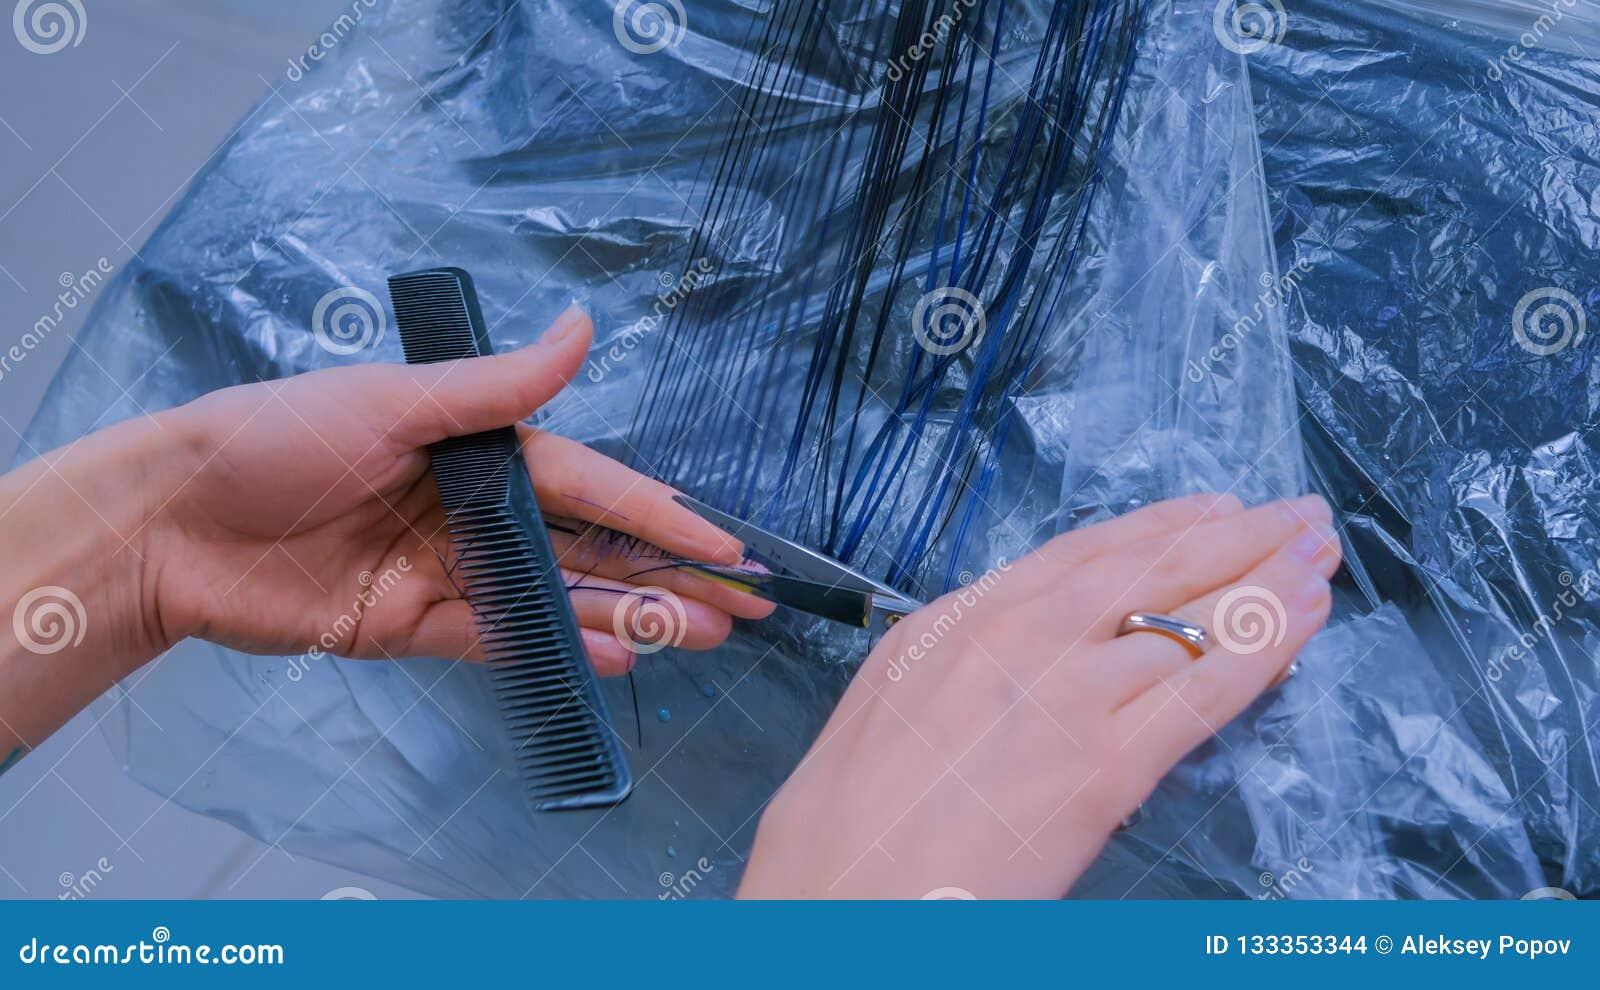 Hairdresser cutting hair of woman client